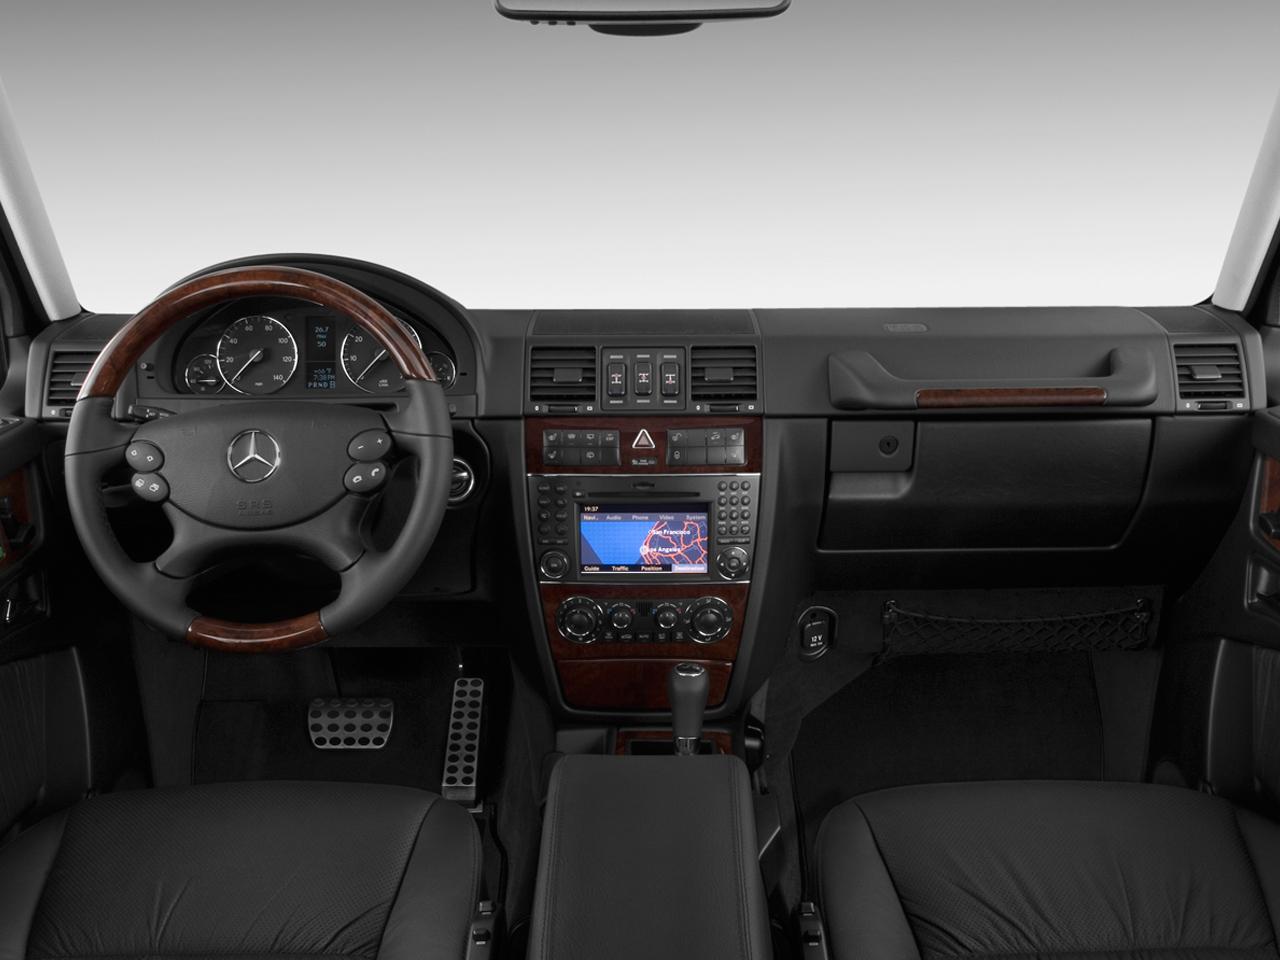 2009 mercedes benz g550 mercedes benz luxury suv review automobile magazine. Black Bedroom Furniture Sets. Home Design Ideas